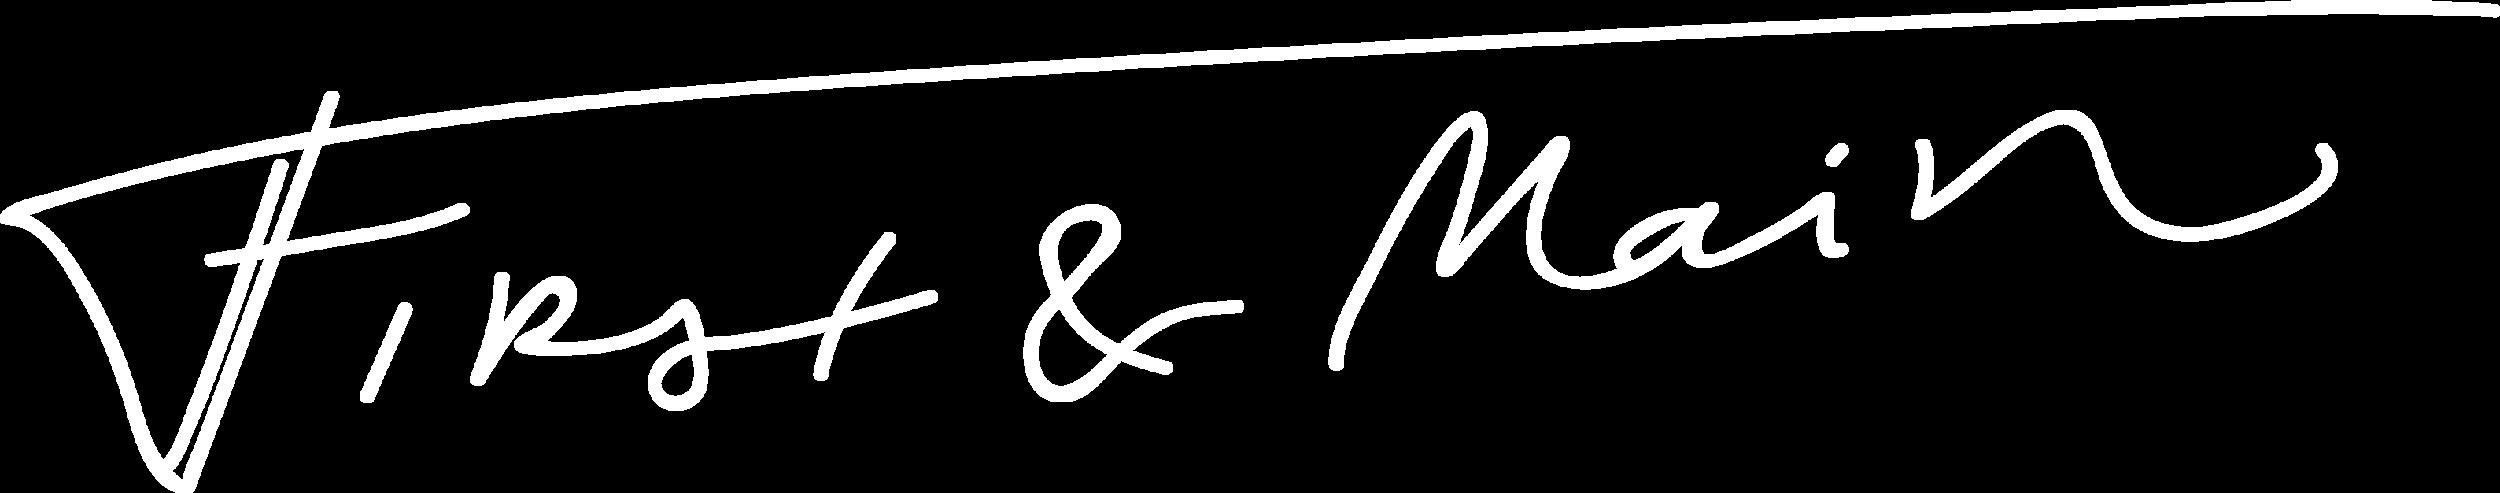 First & Main Logo White.png